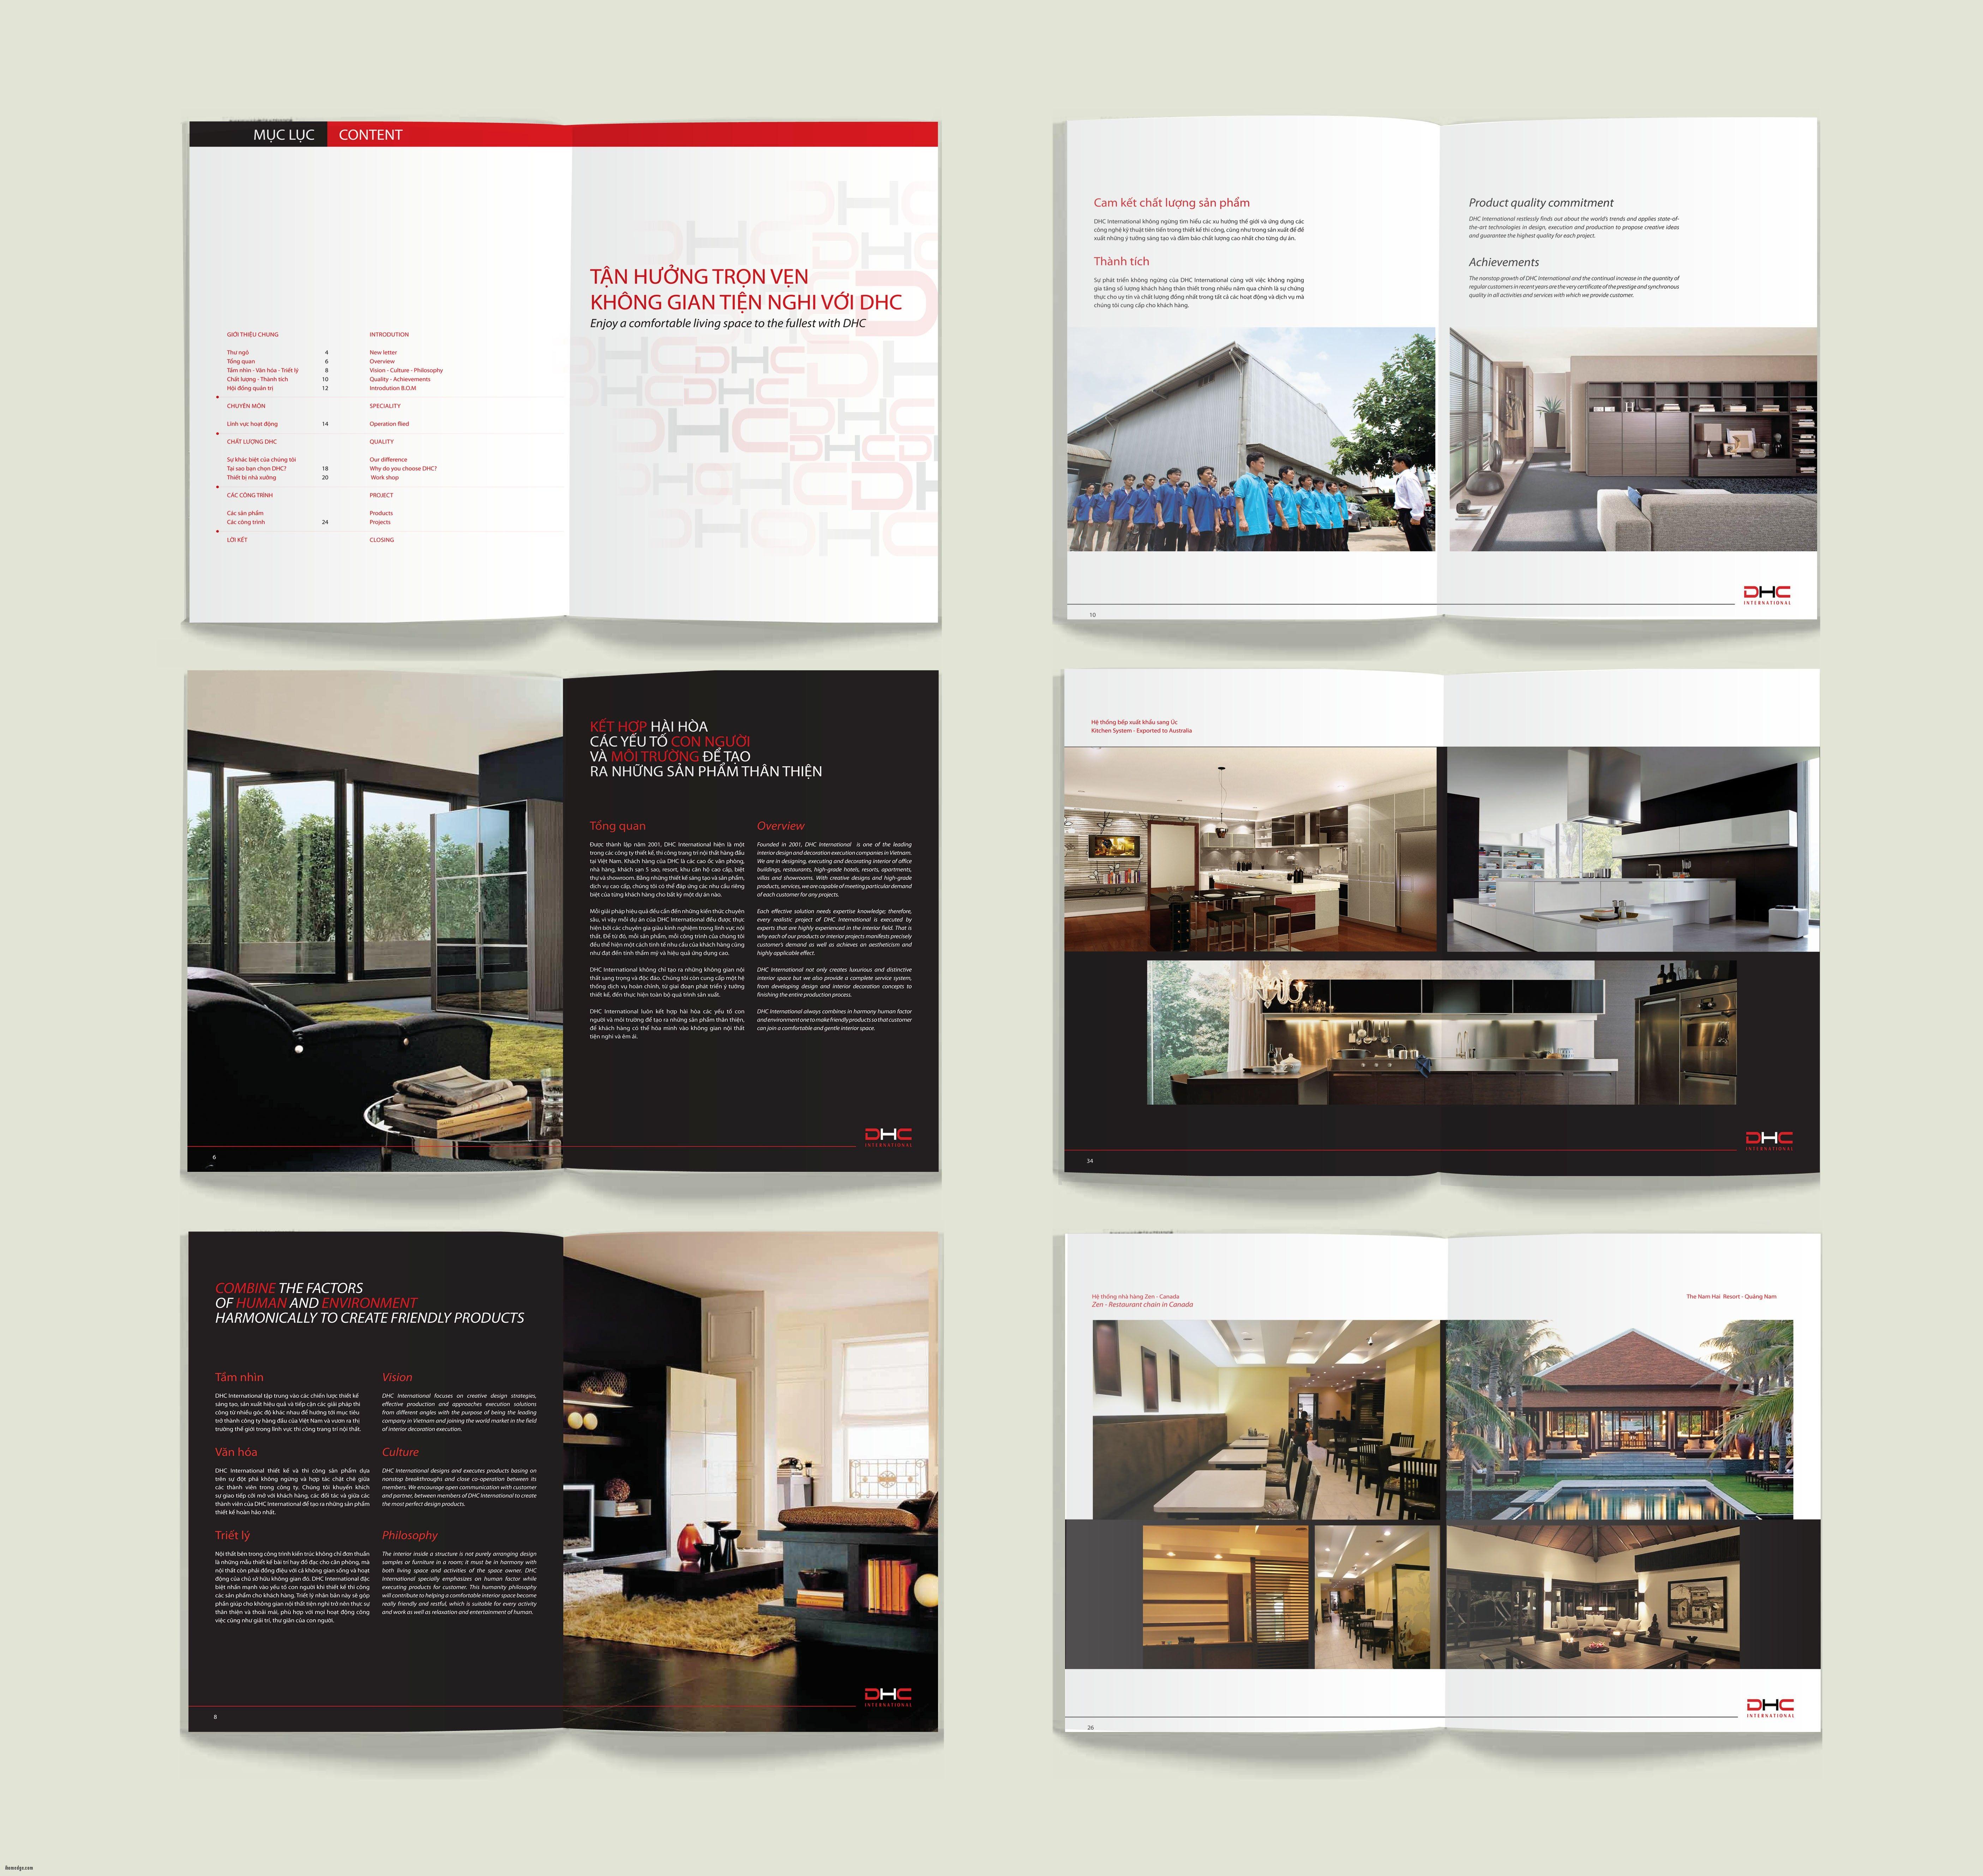 new Amazing Interior Company Profile pany by Minh Tho Vu at